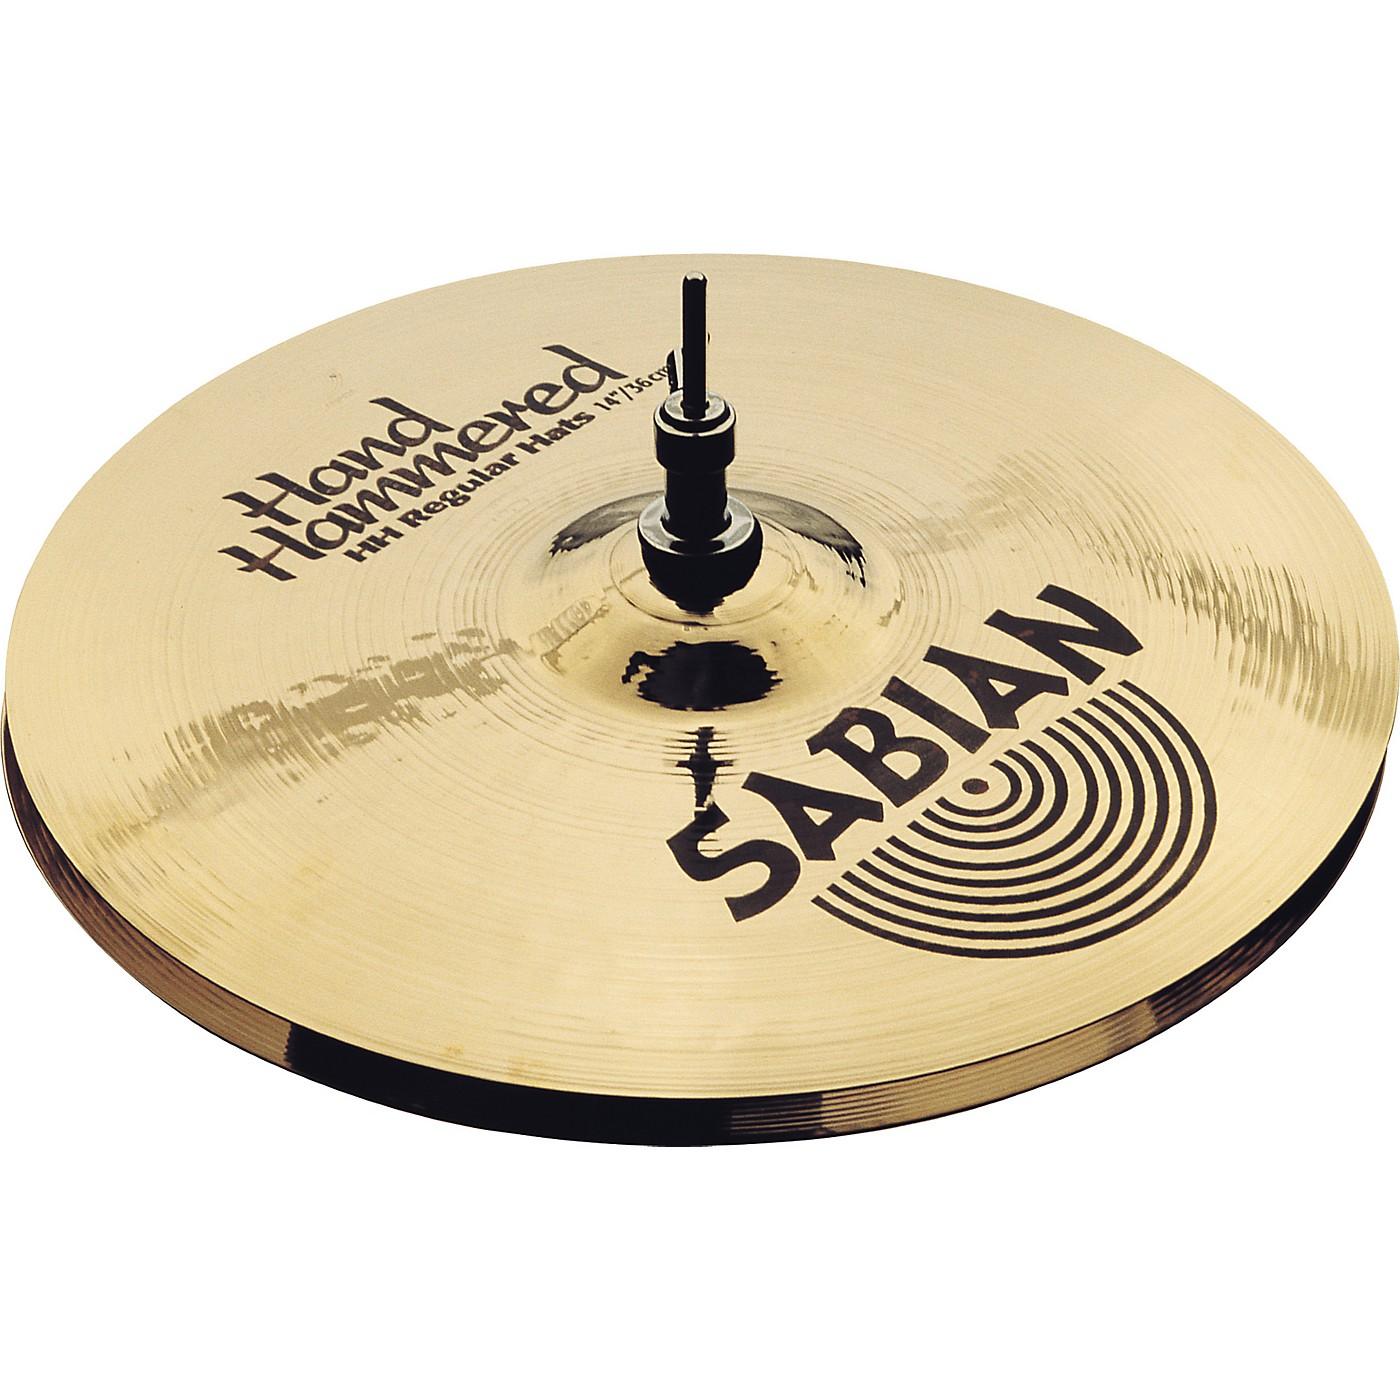 Sabian Hand Hammered Medium Hi-Hat Cymbals 14